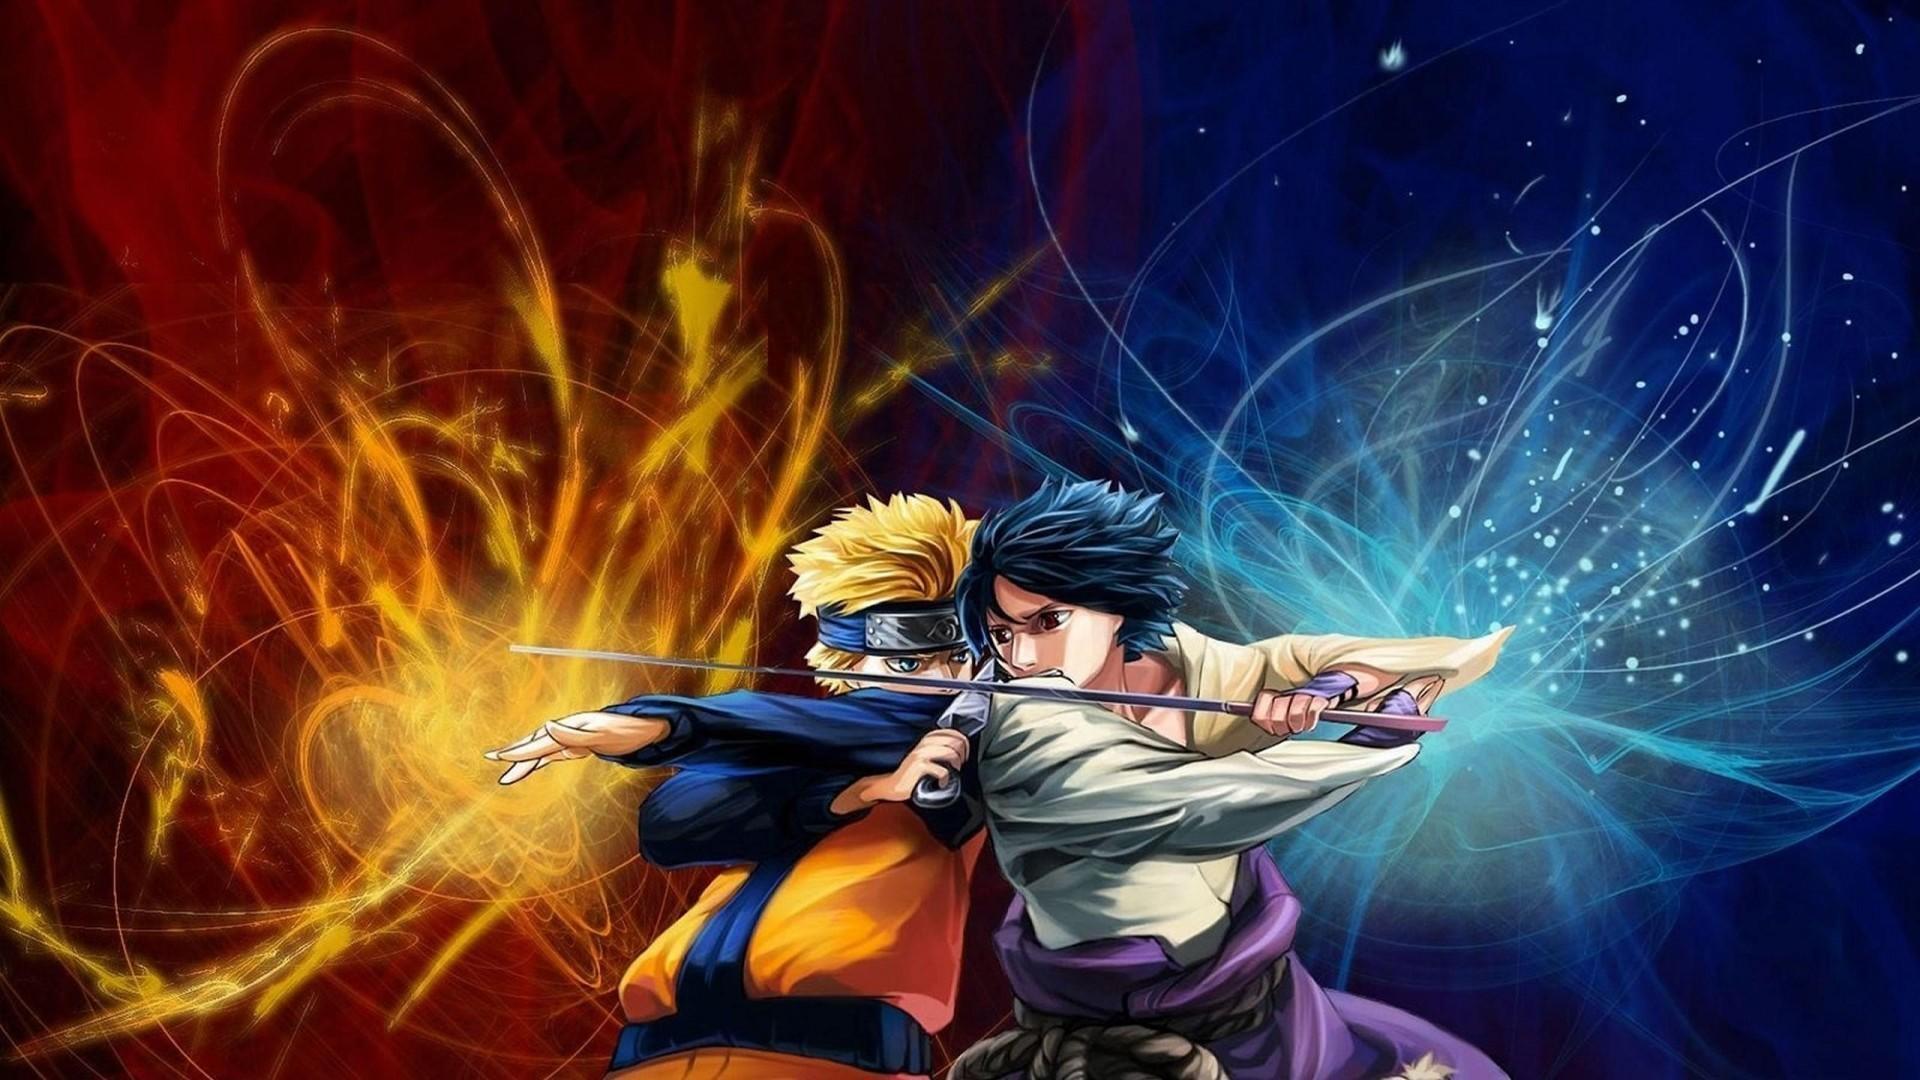 Naruto Vs Sasuke Wallpapers 1920x1080